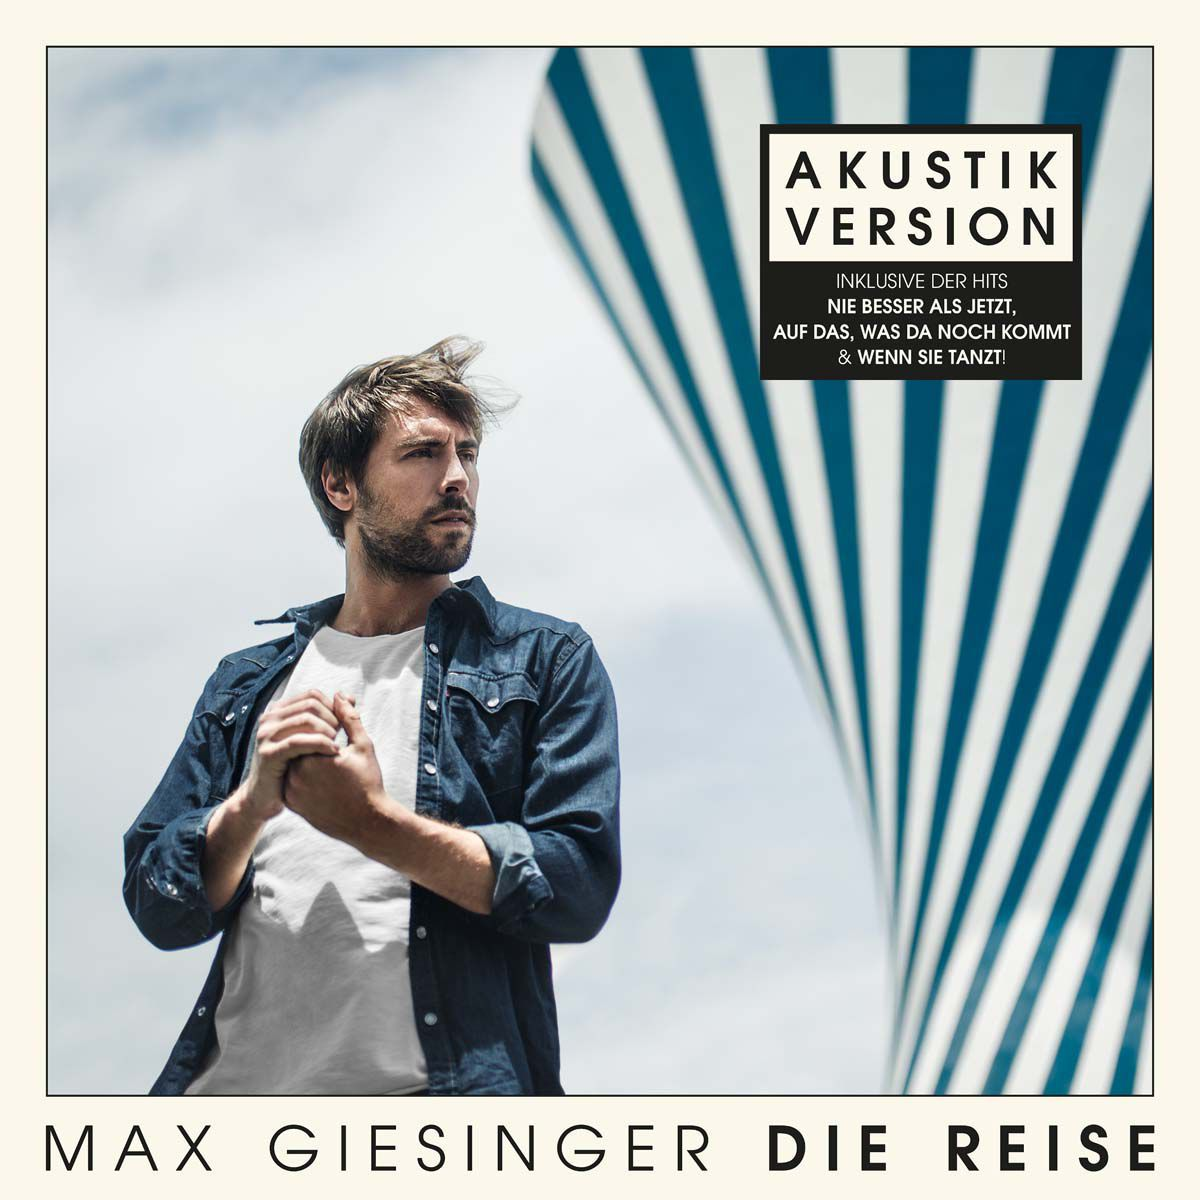 Max Giesinger wurde in der Schule gemobbt